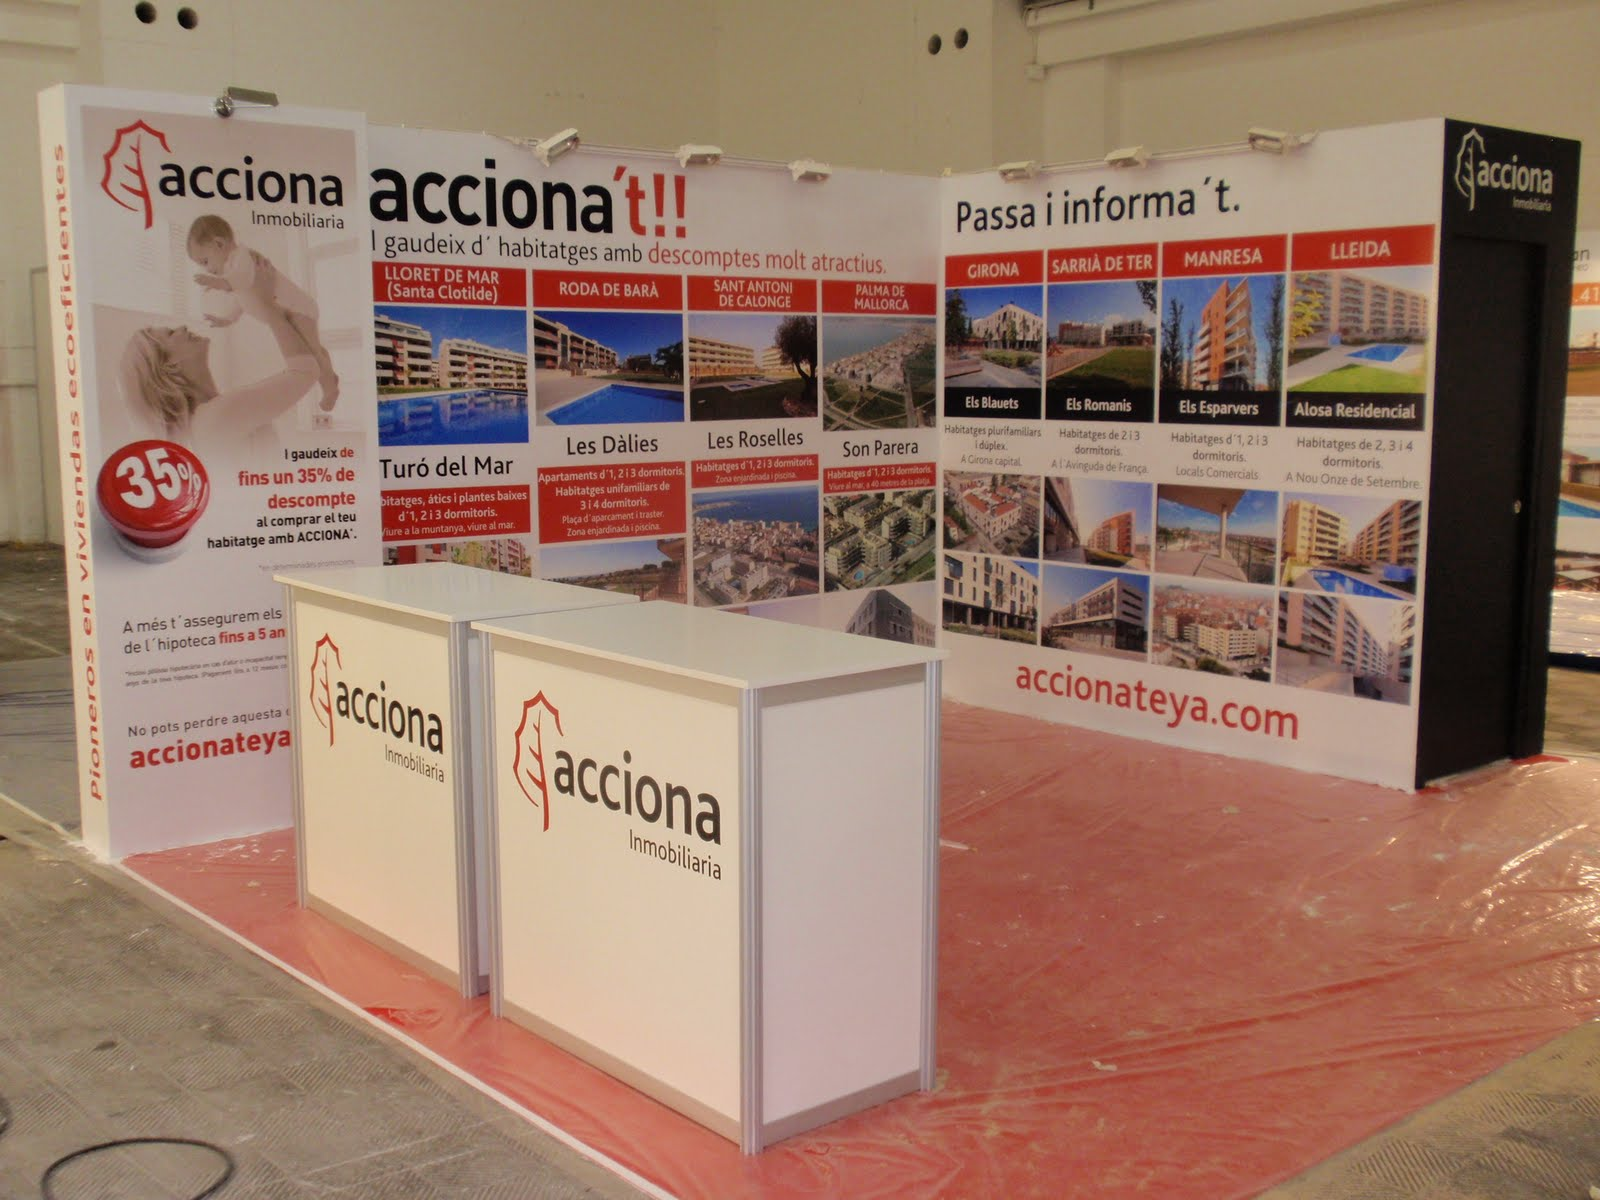 Stand Acciona Fira 3 Montjuic (Barcelona)